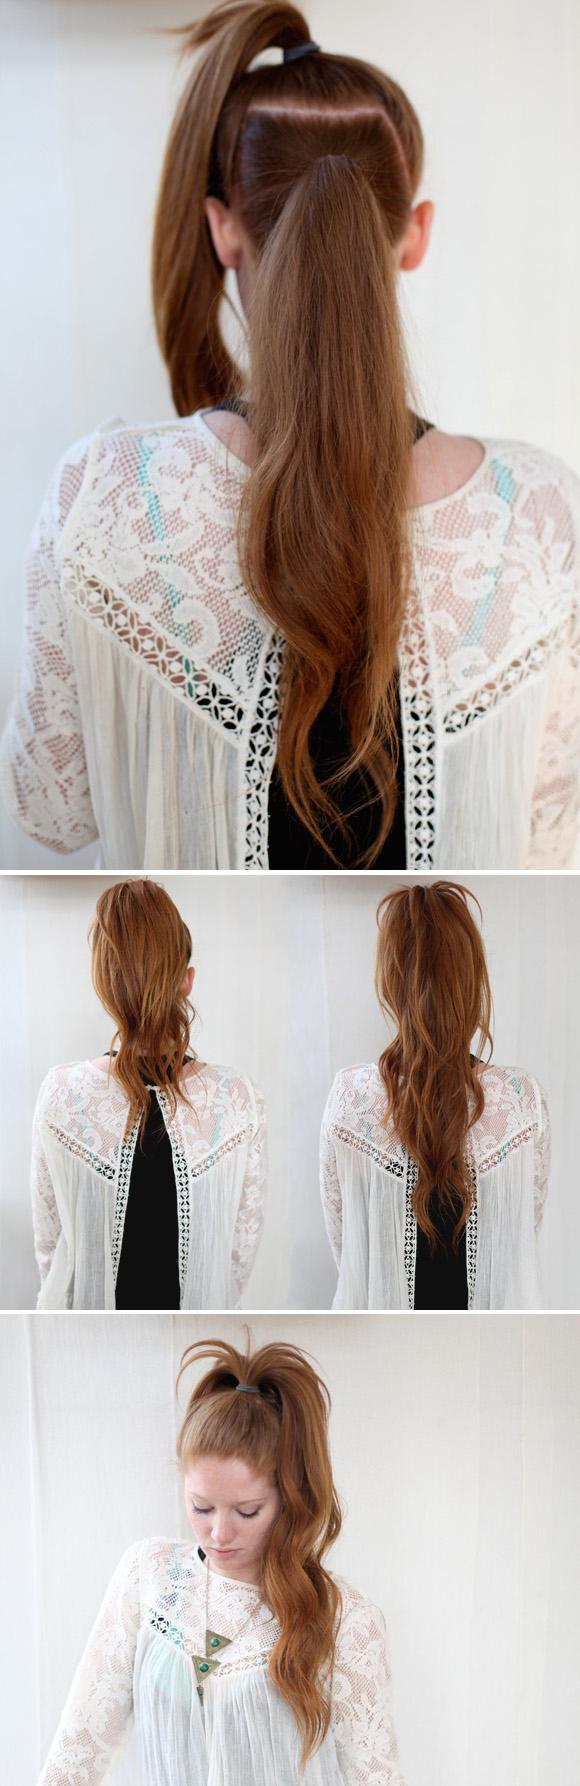 kiểu buộc tóc đẹp 08